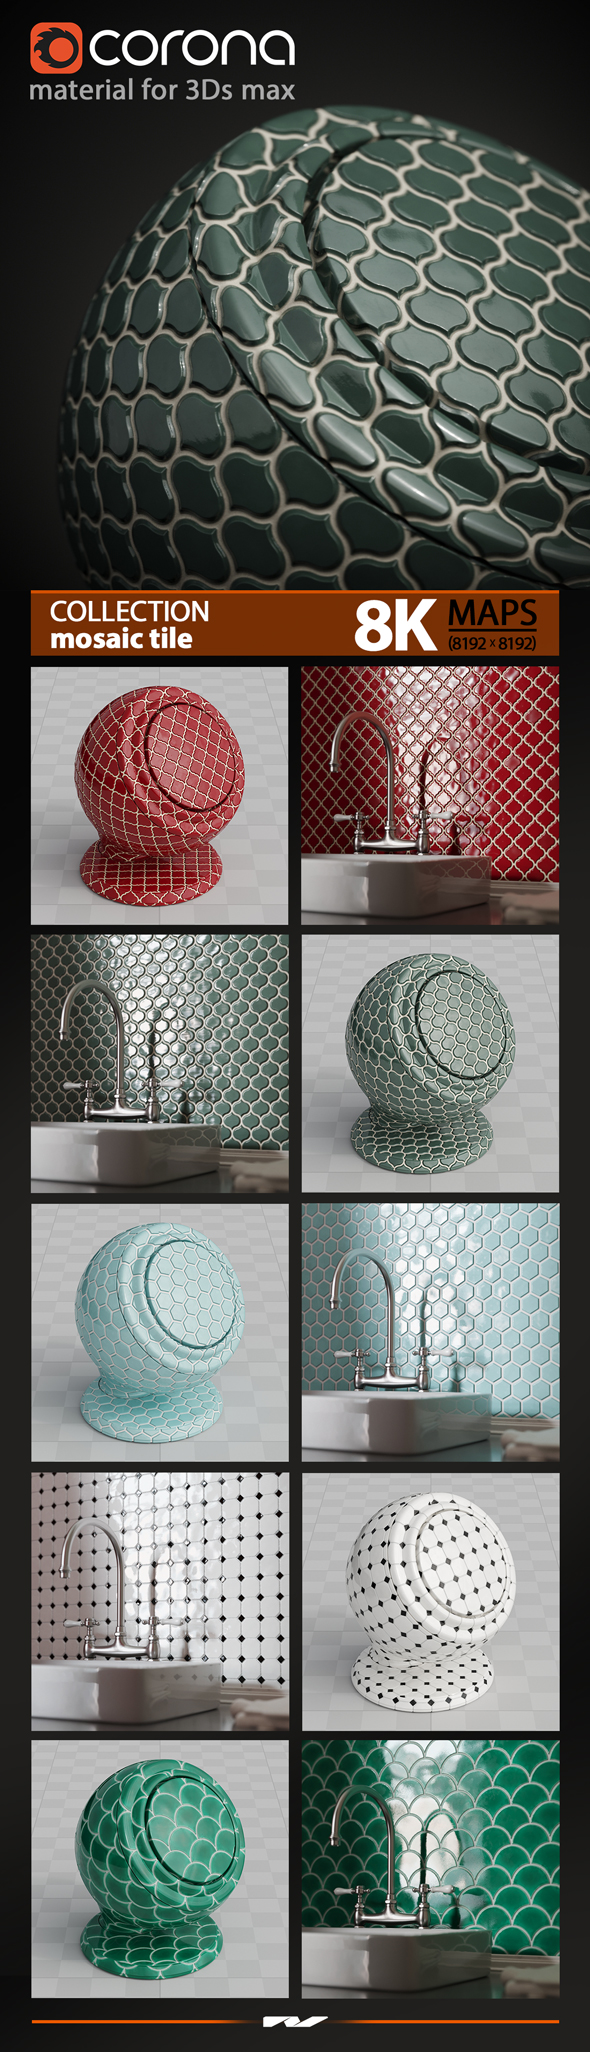 3Ds max Mosaic Tile Material. Corona render - 3DOcean Item for Sale